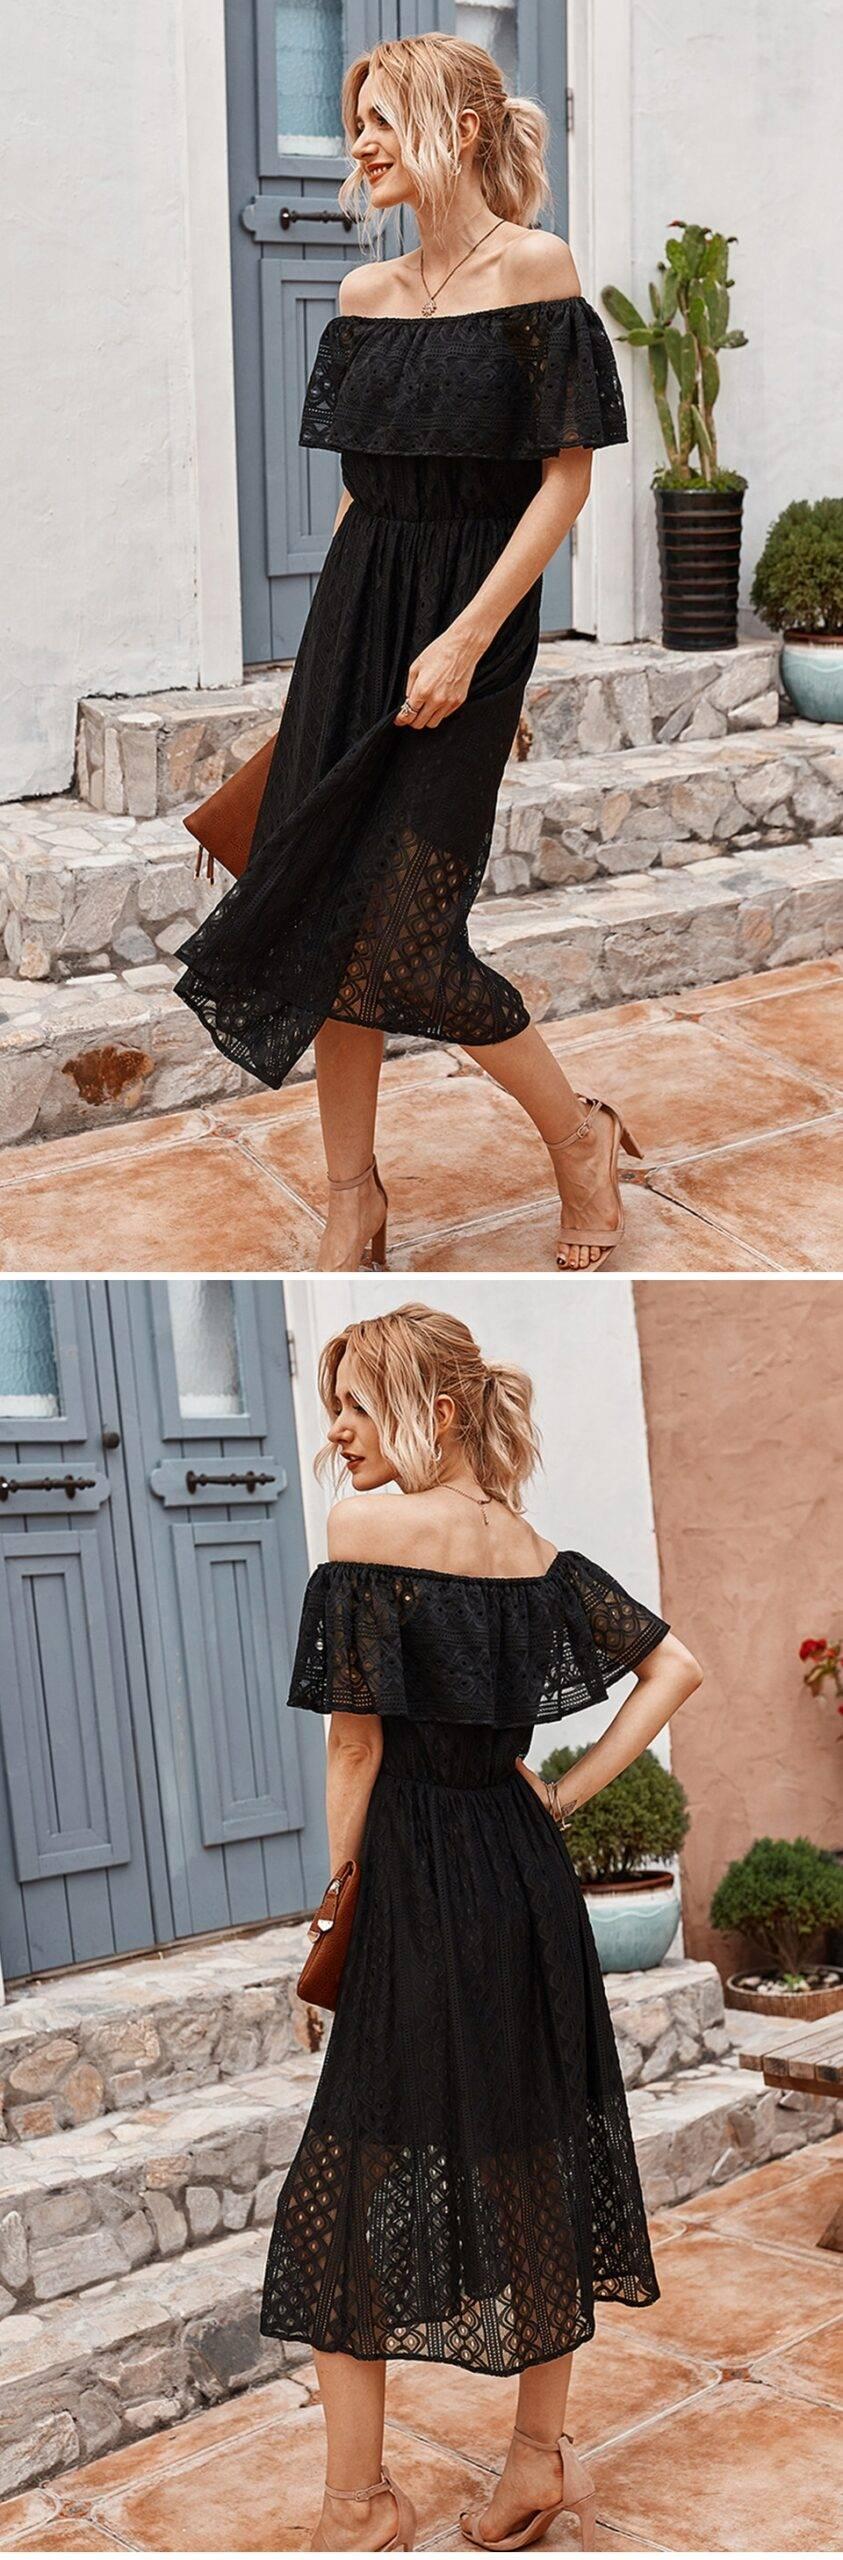 Dress Party 2021 Women Elegant Long Dress Slash Neck Hollow Midi Party Dress Lady Summer Bodycon Black Dress Backless Clothes